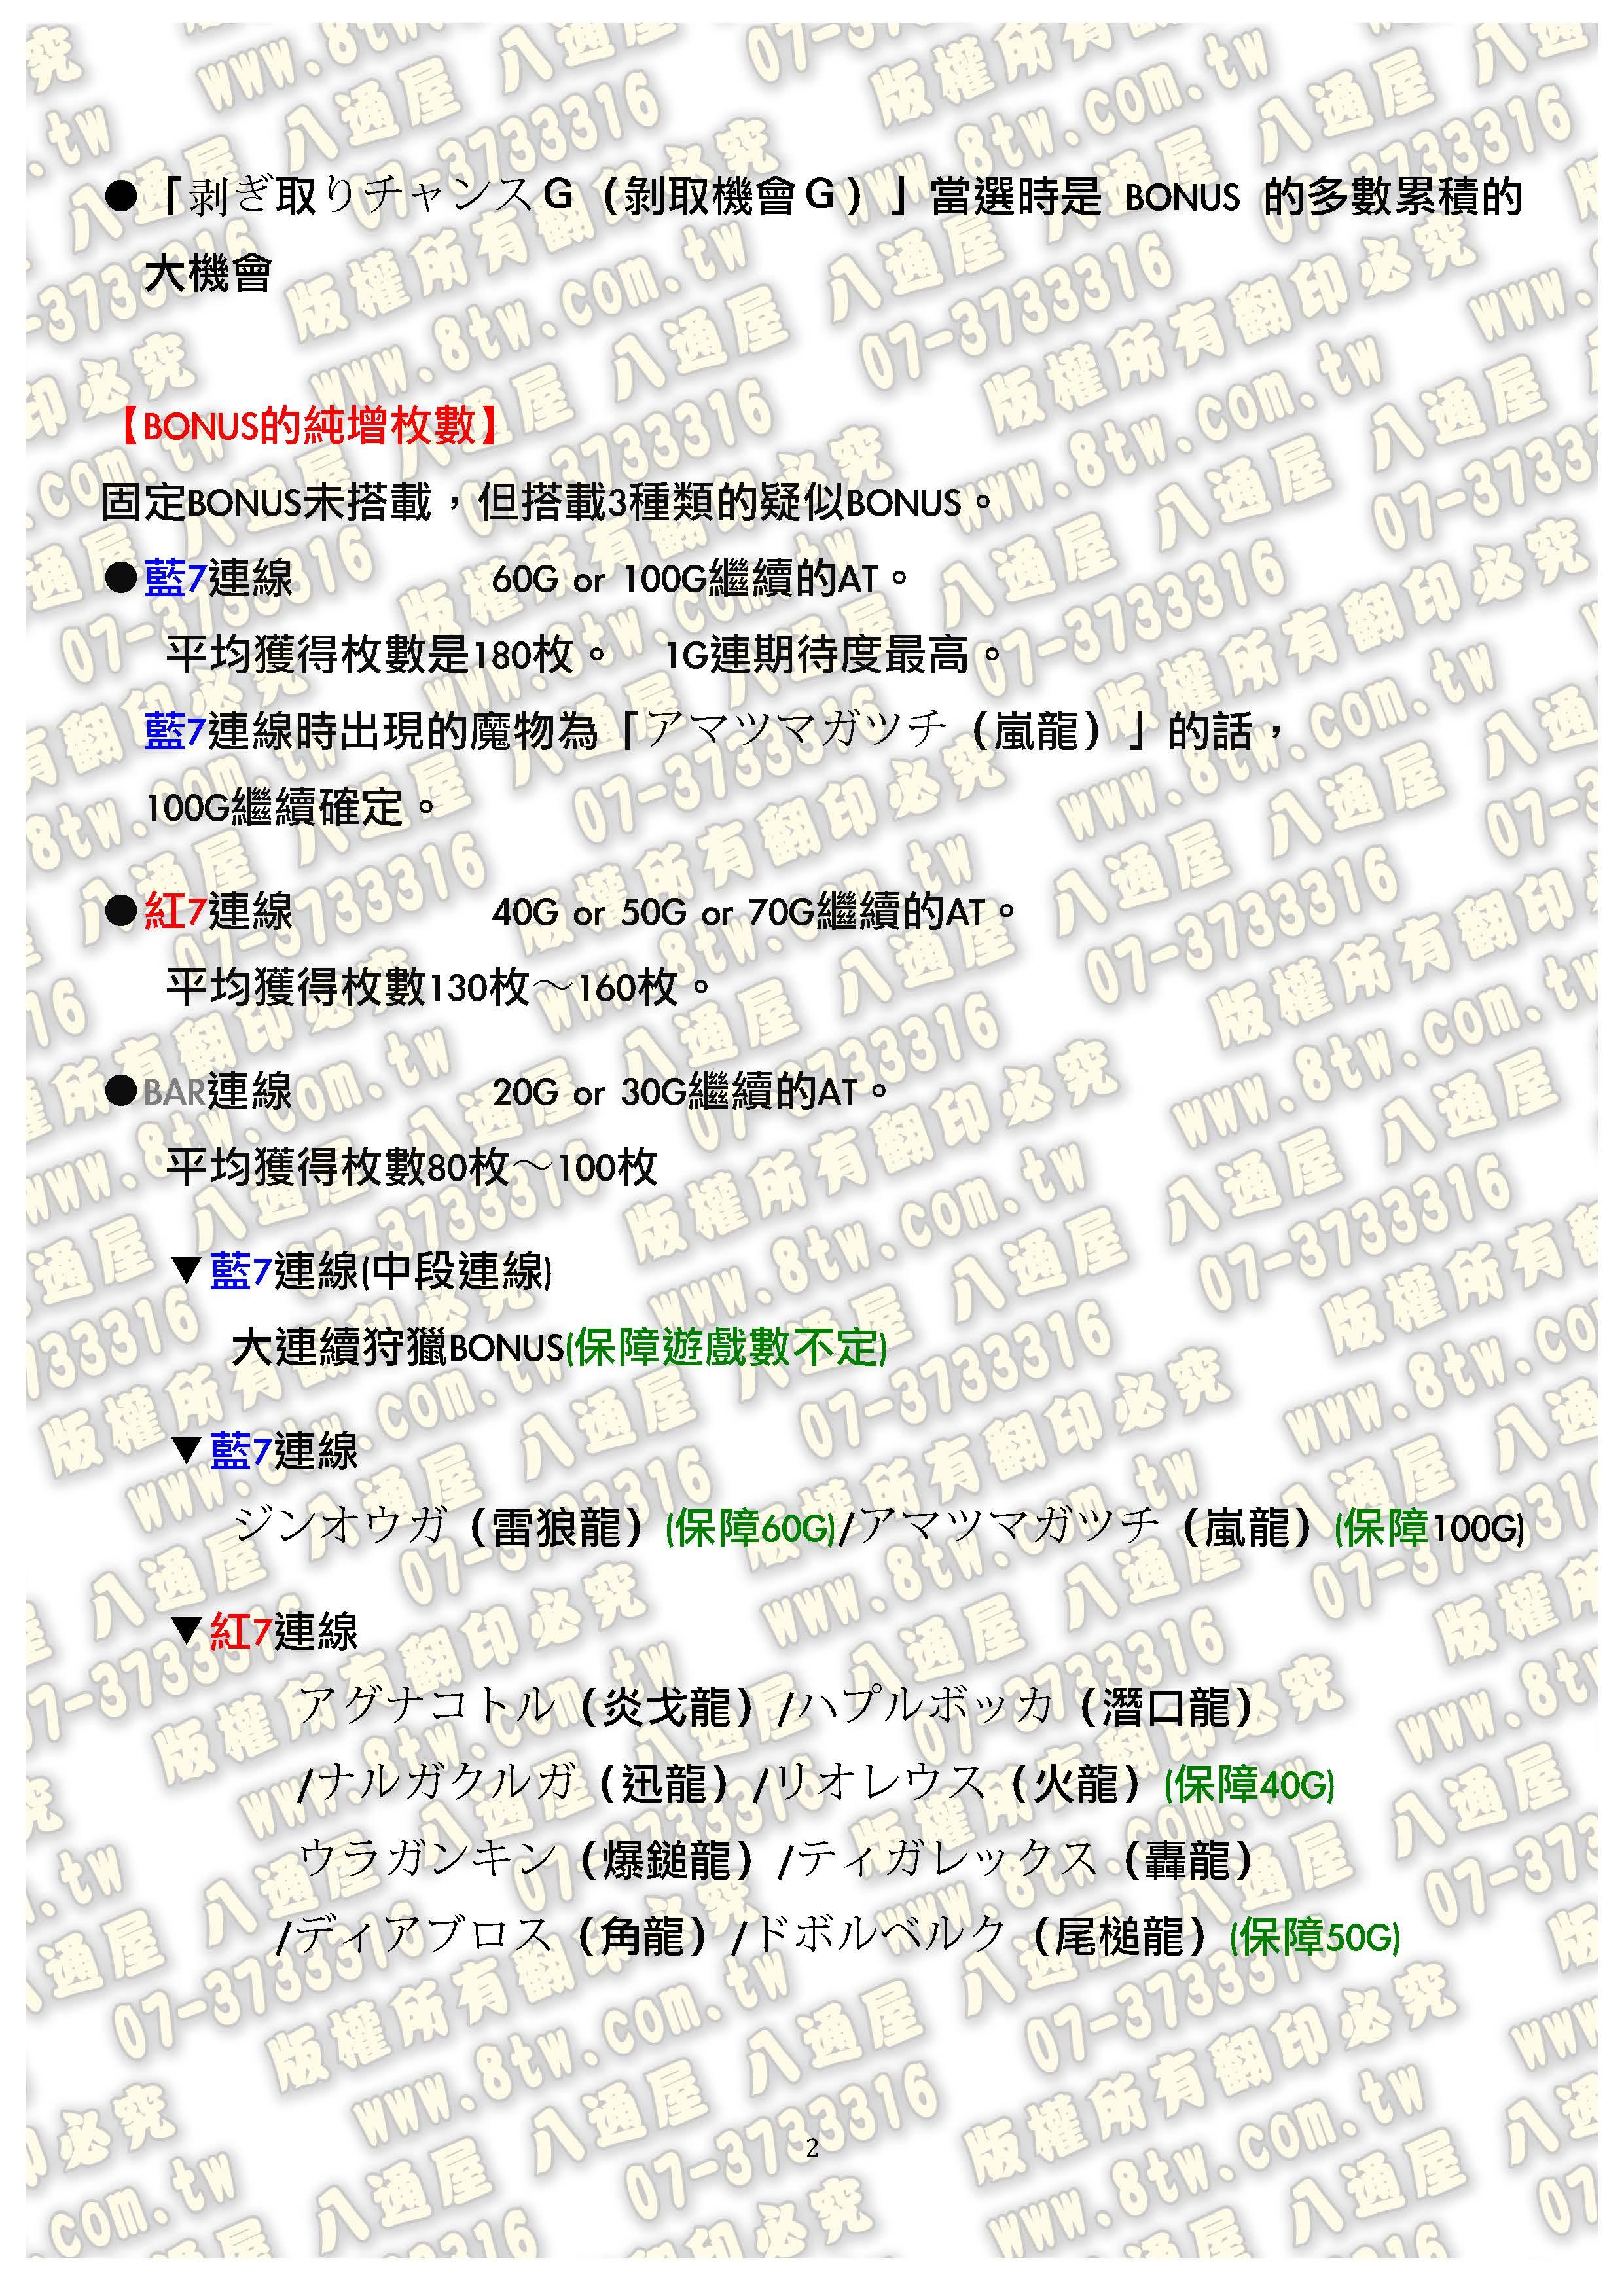 S0202魔物獵人 月下雷鳴 中文版攻略_Page_03